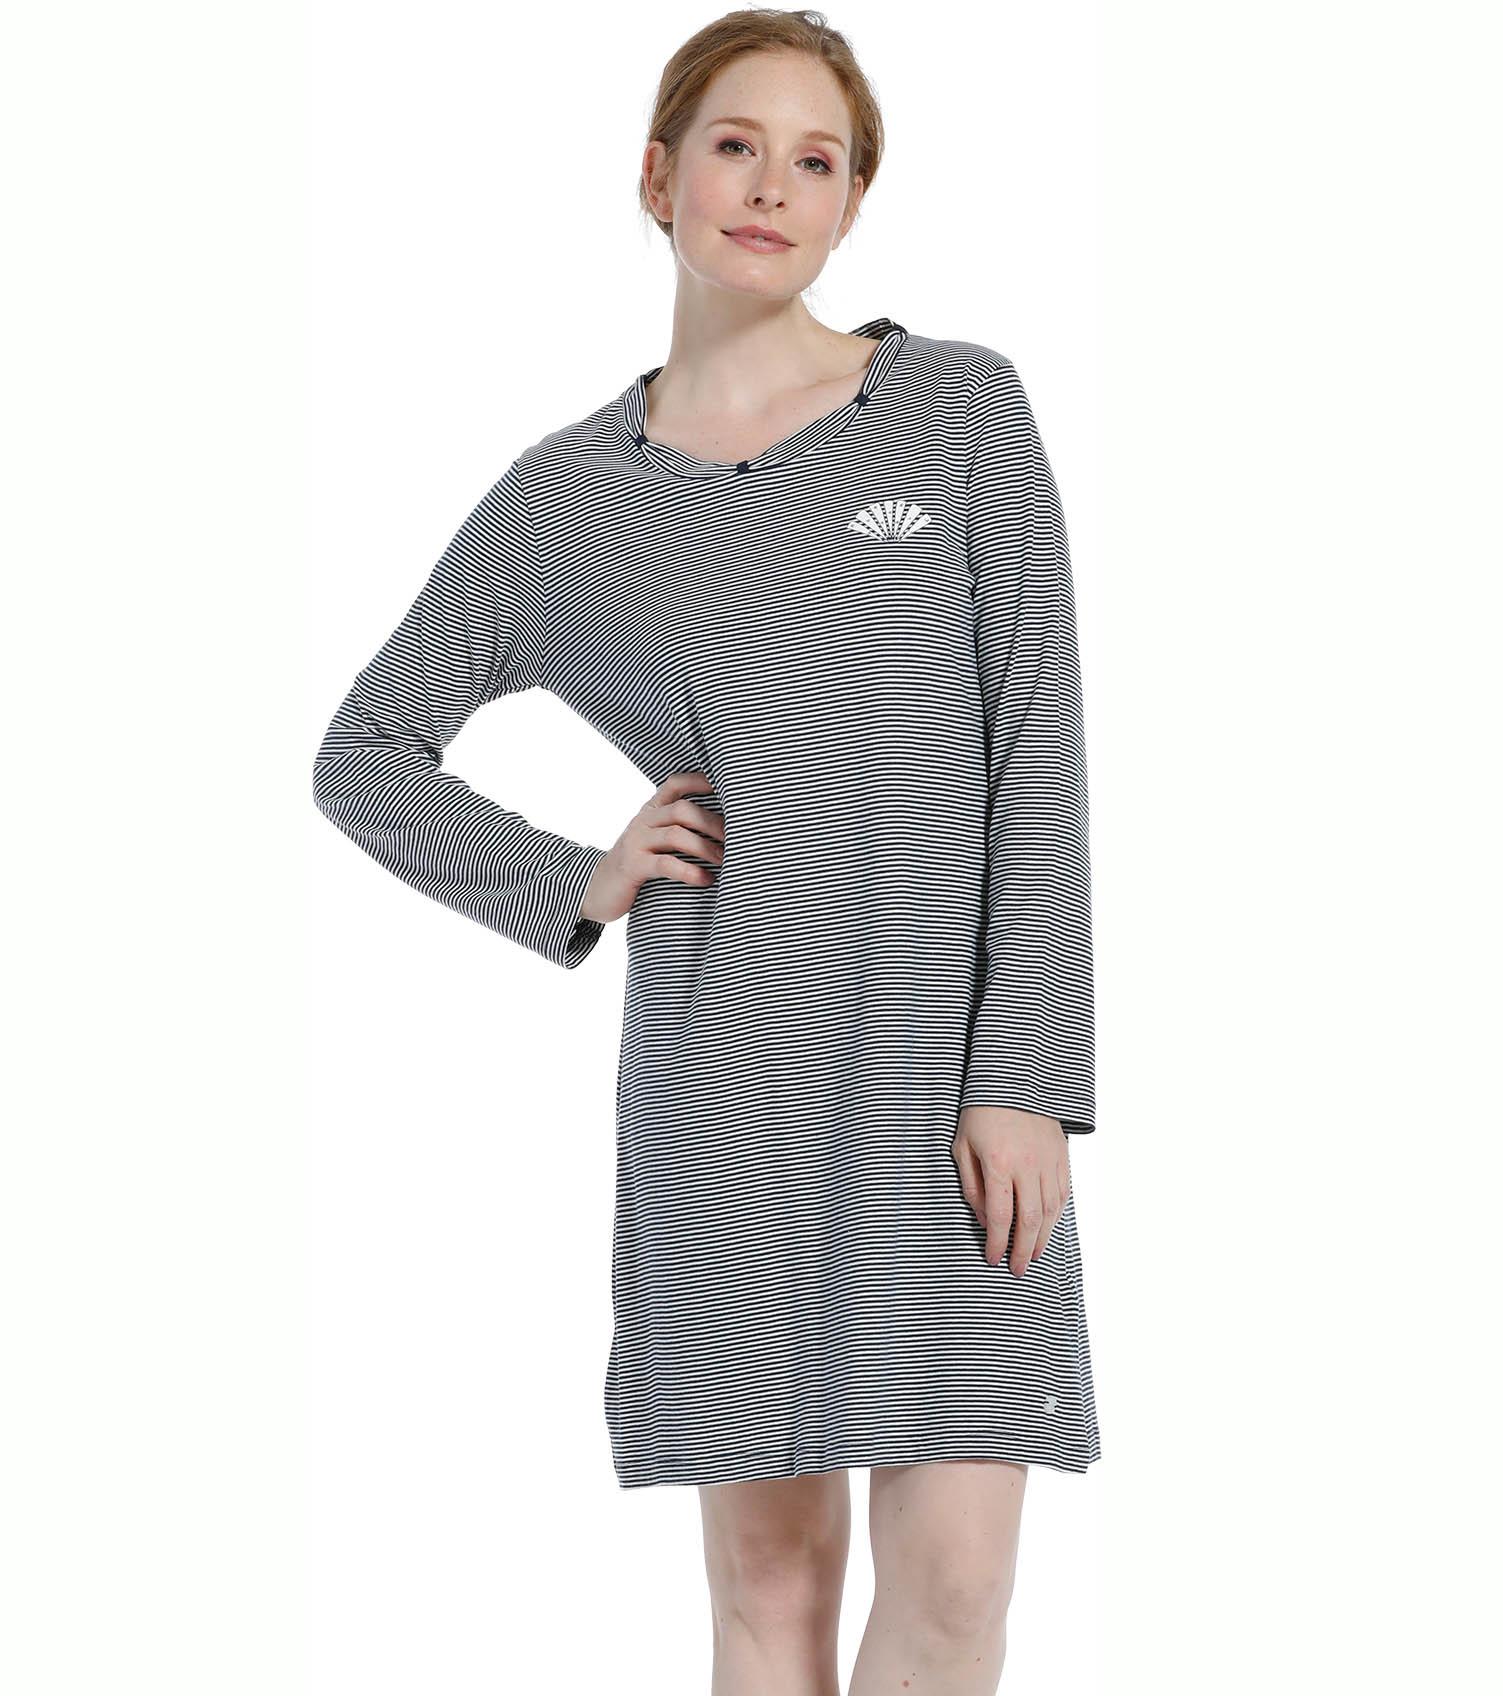 Pastunette dames nachthemd L/M Waiver